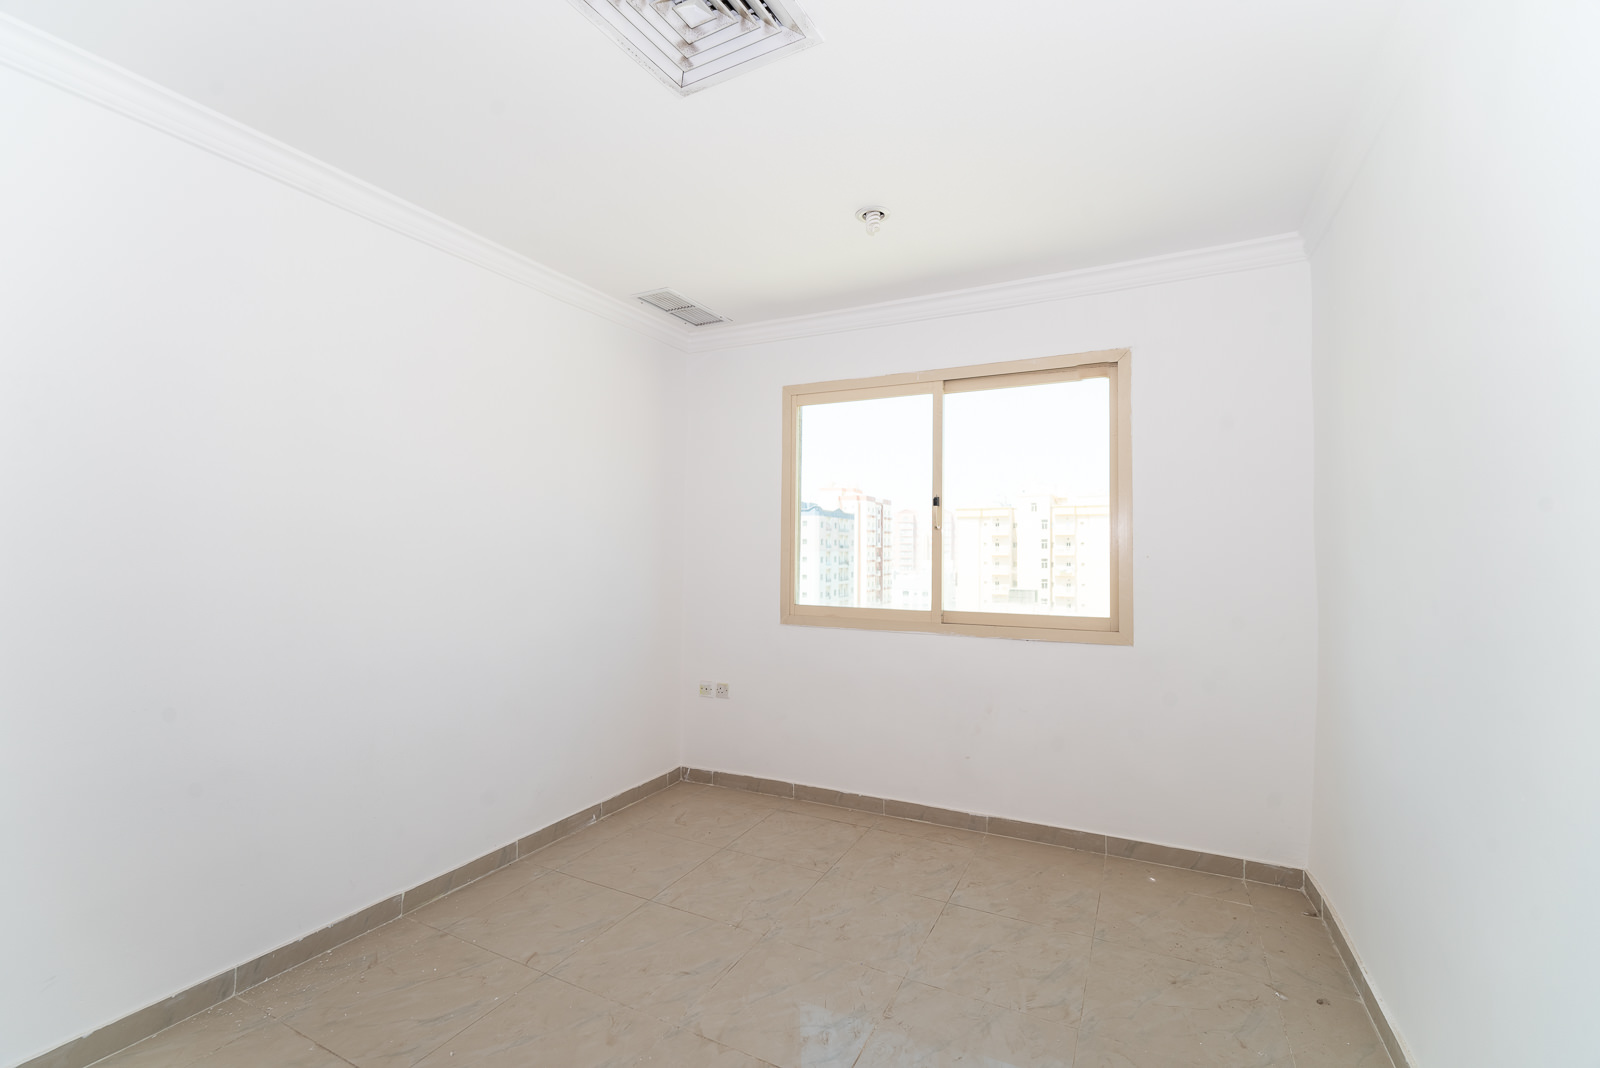 Salmiya  – small, unfurnished, two bedroom apartment